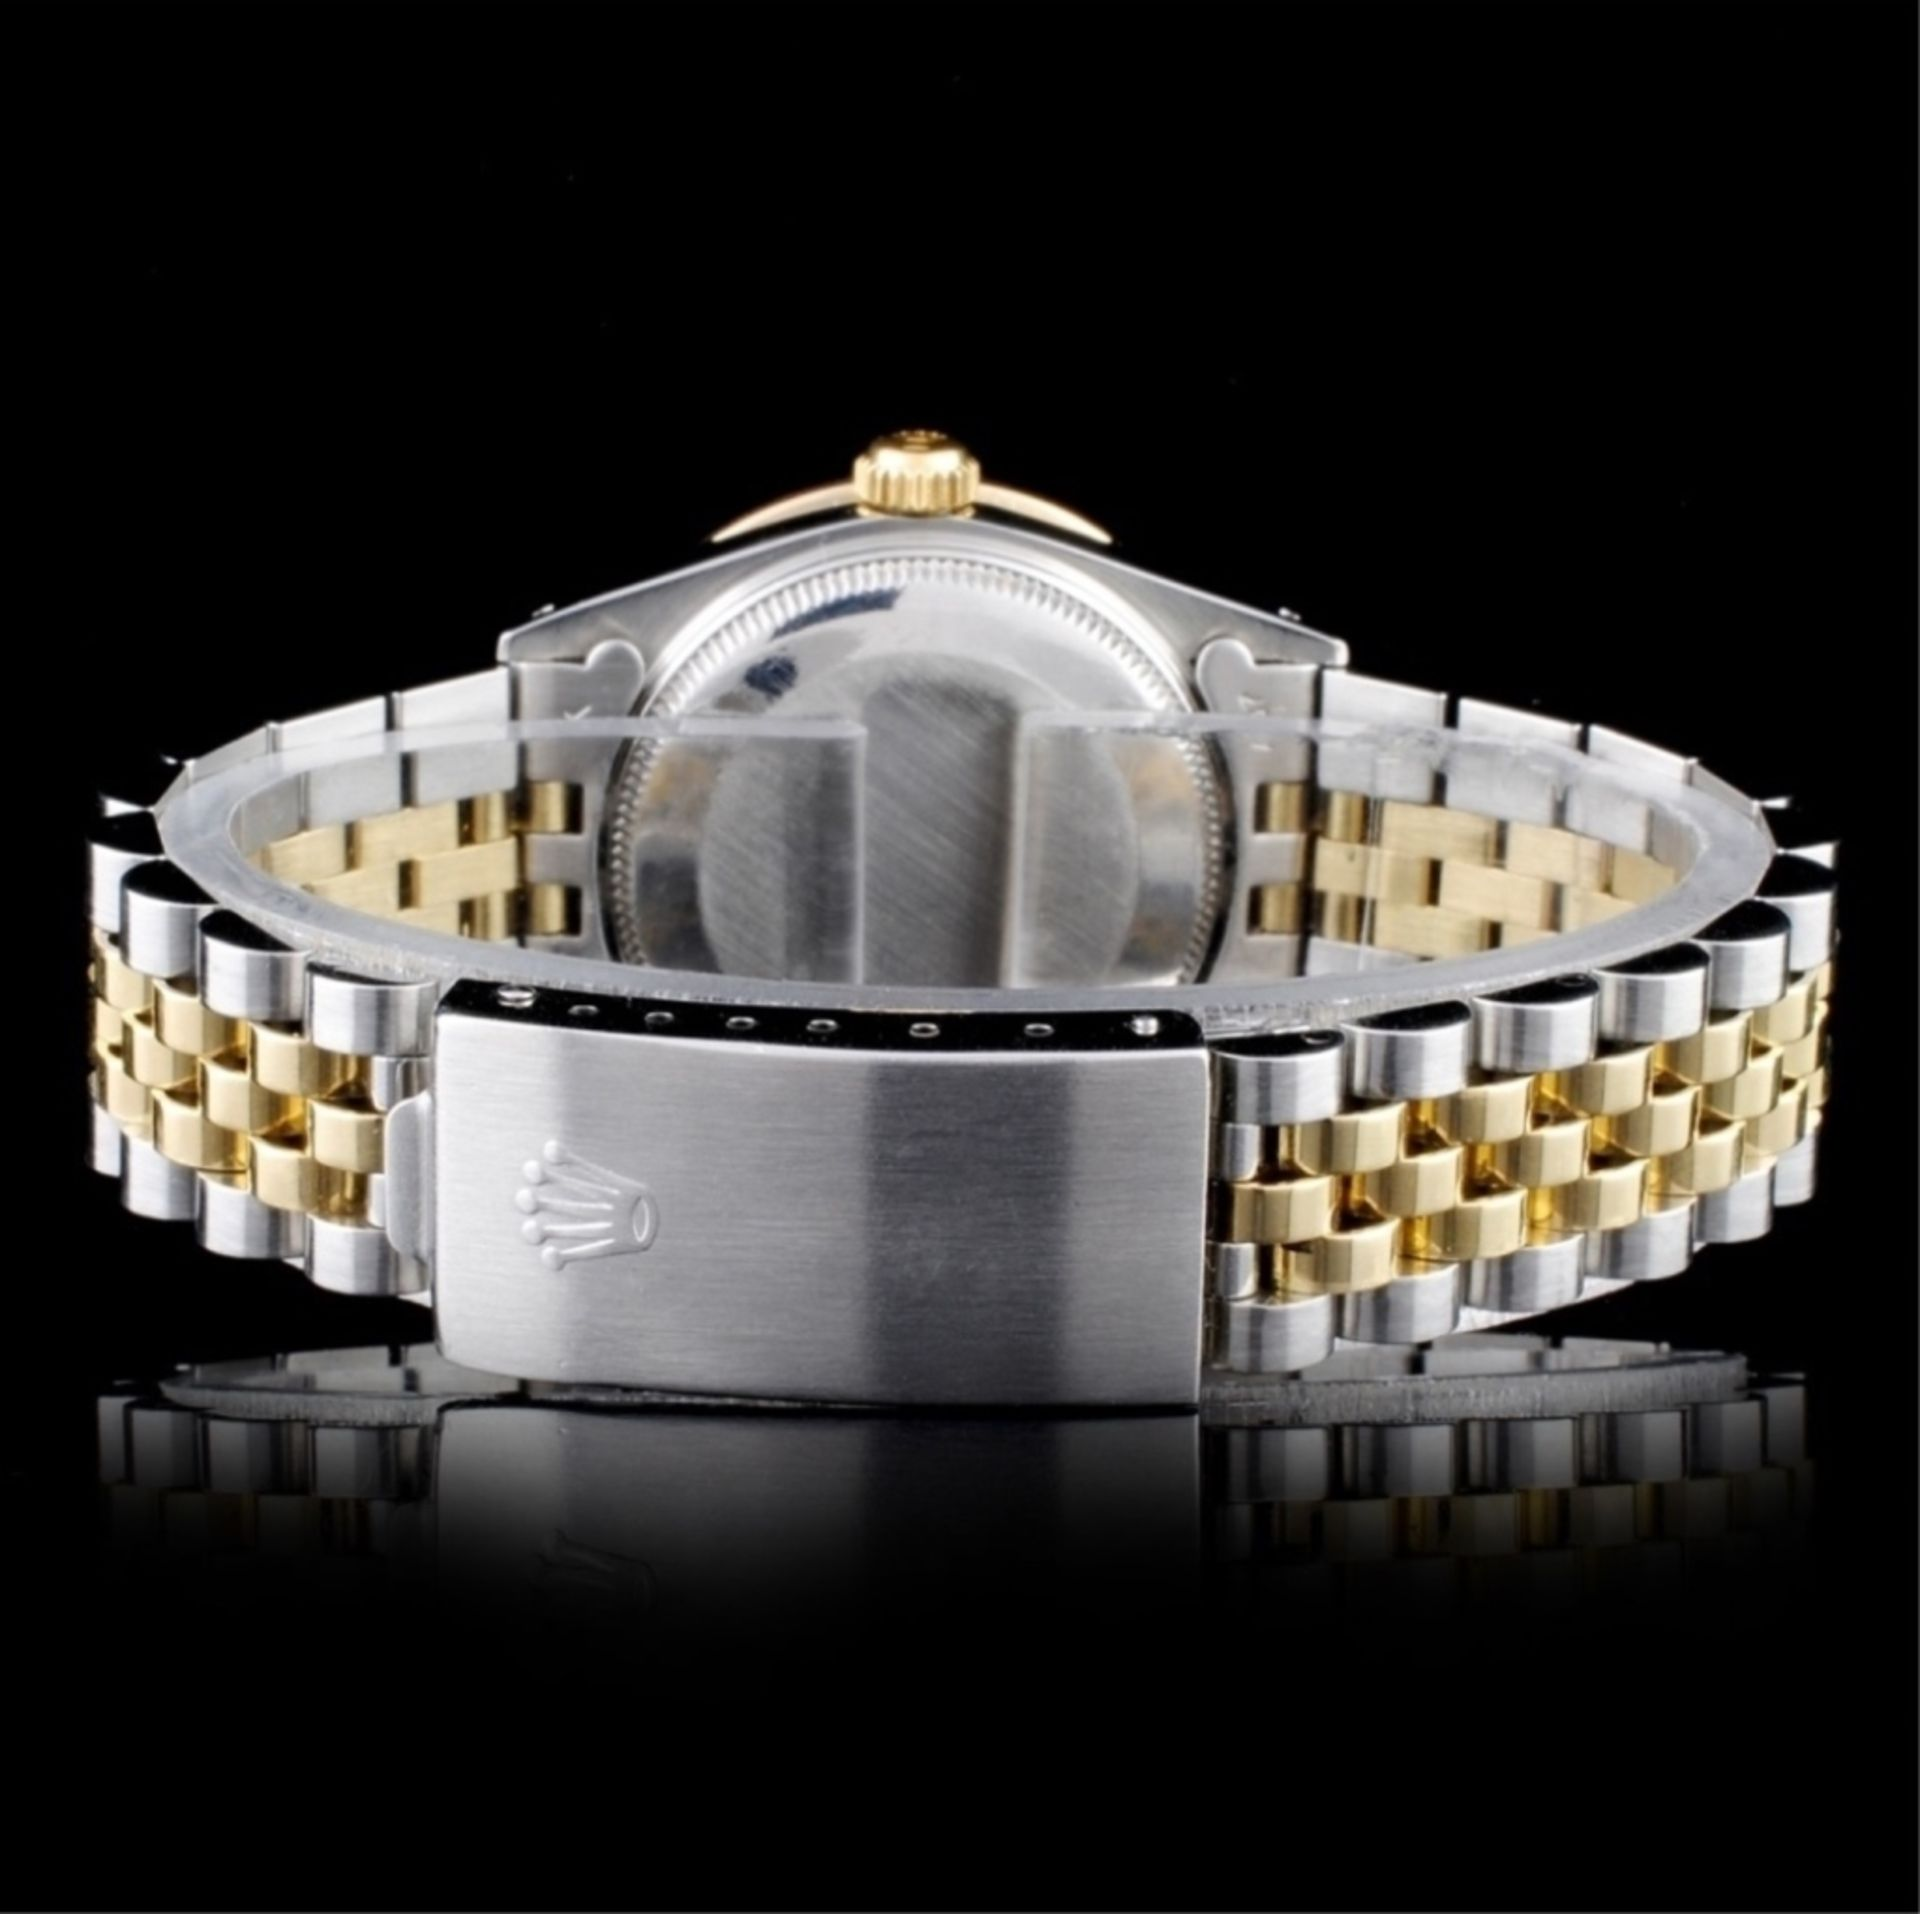 Rolex DateJust Diamond 31mm Wristwatch - Image 3 of 5